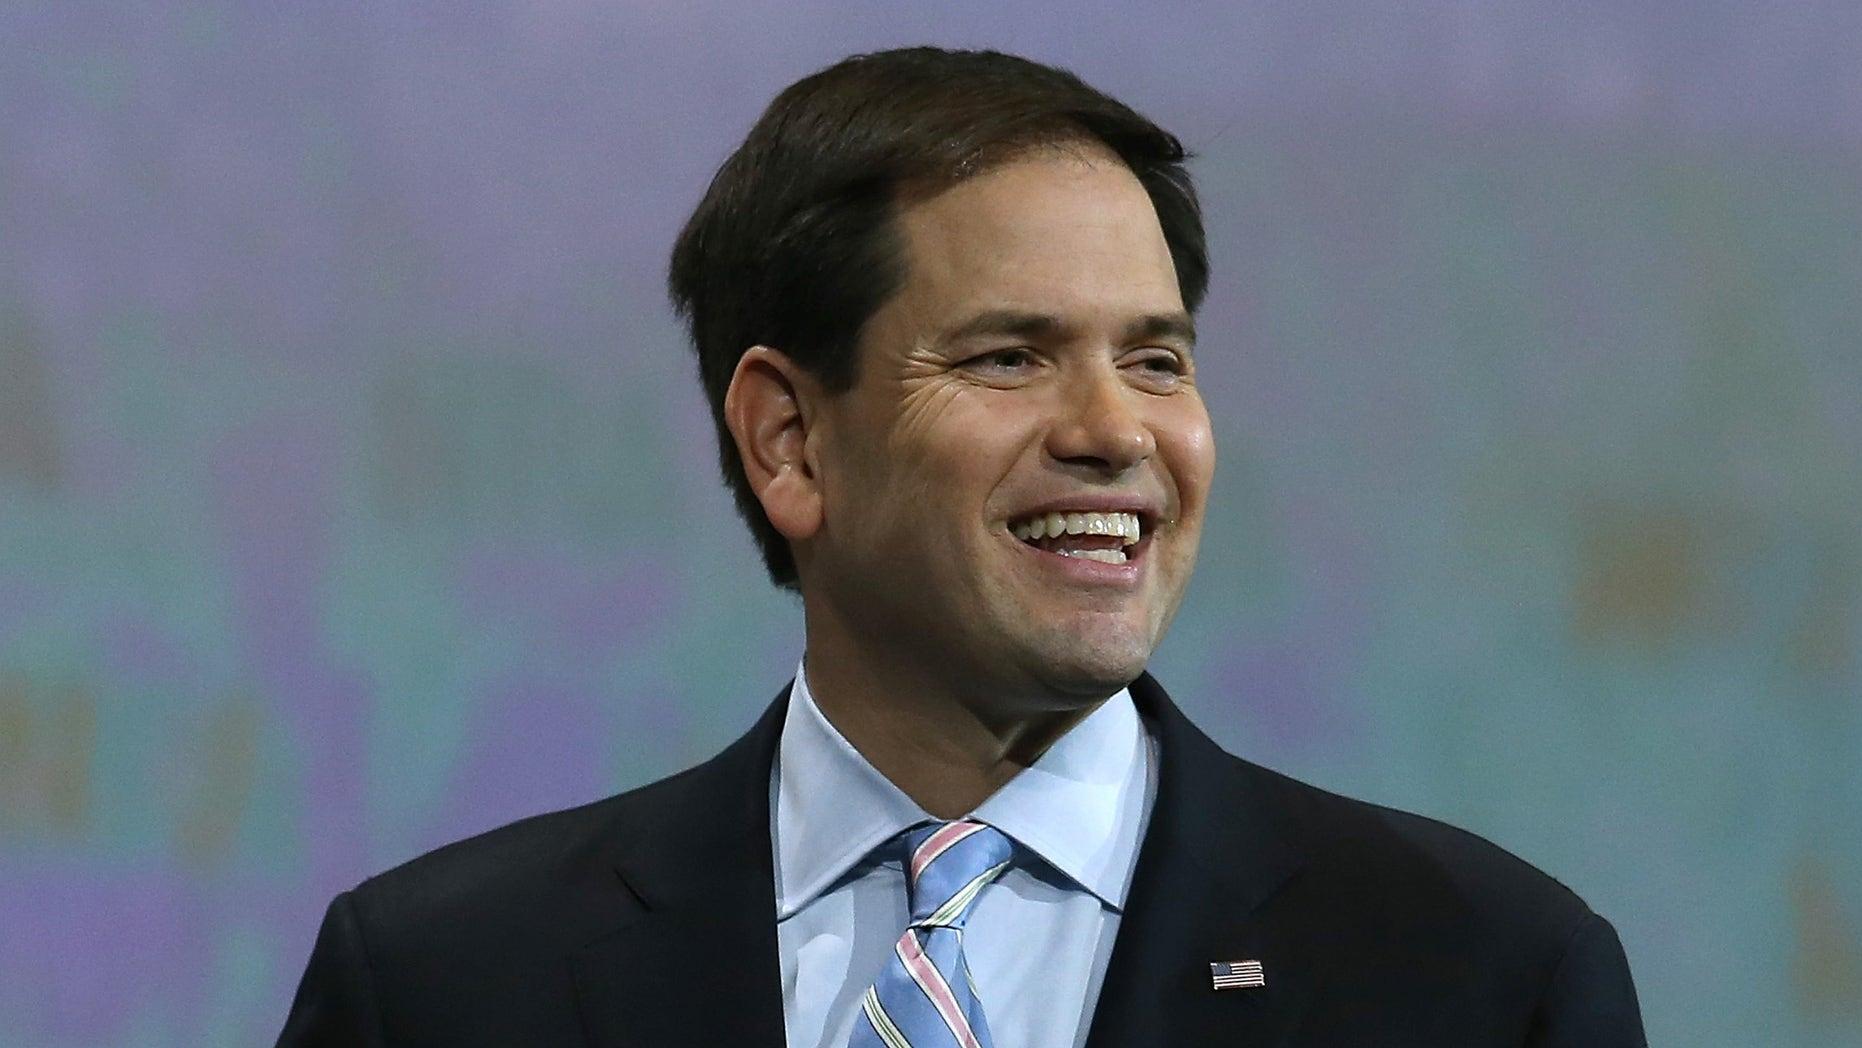 Sen. Marco Rubio